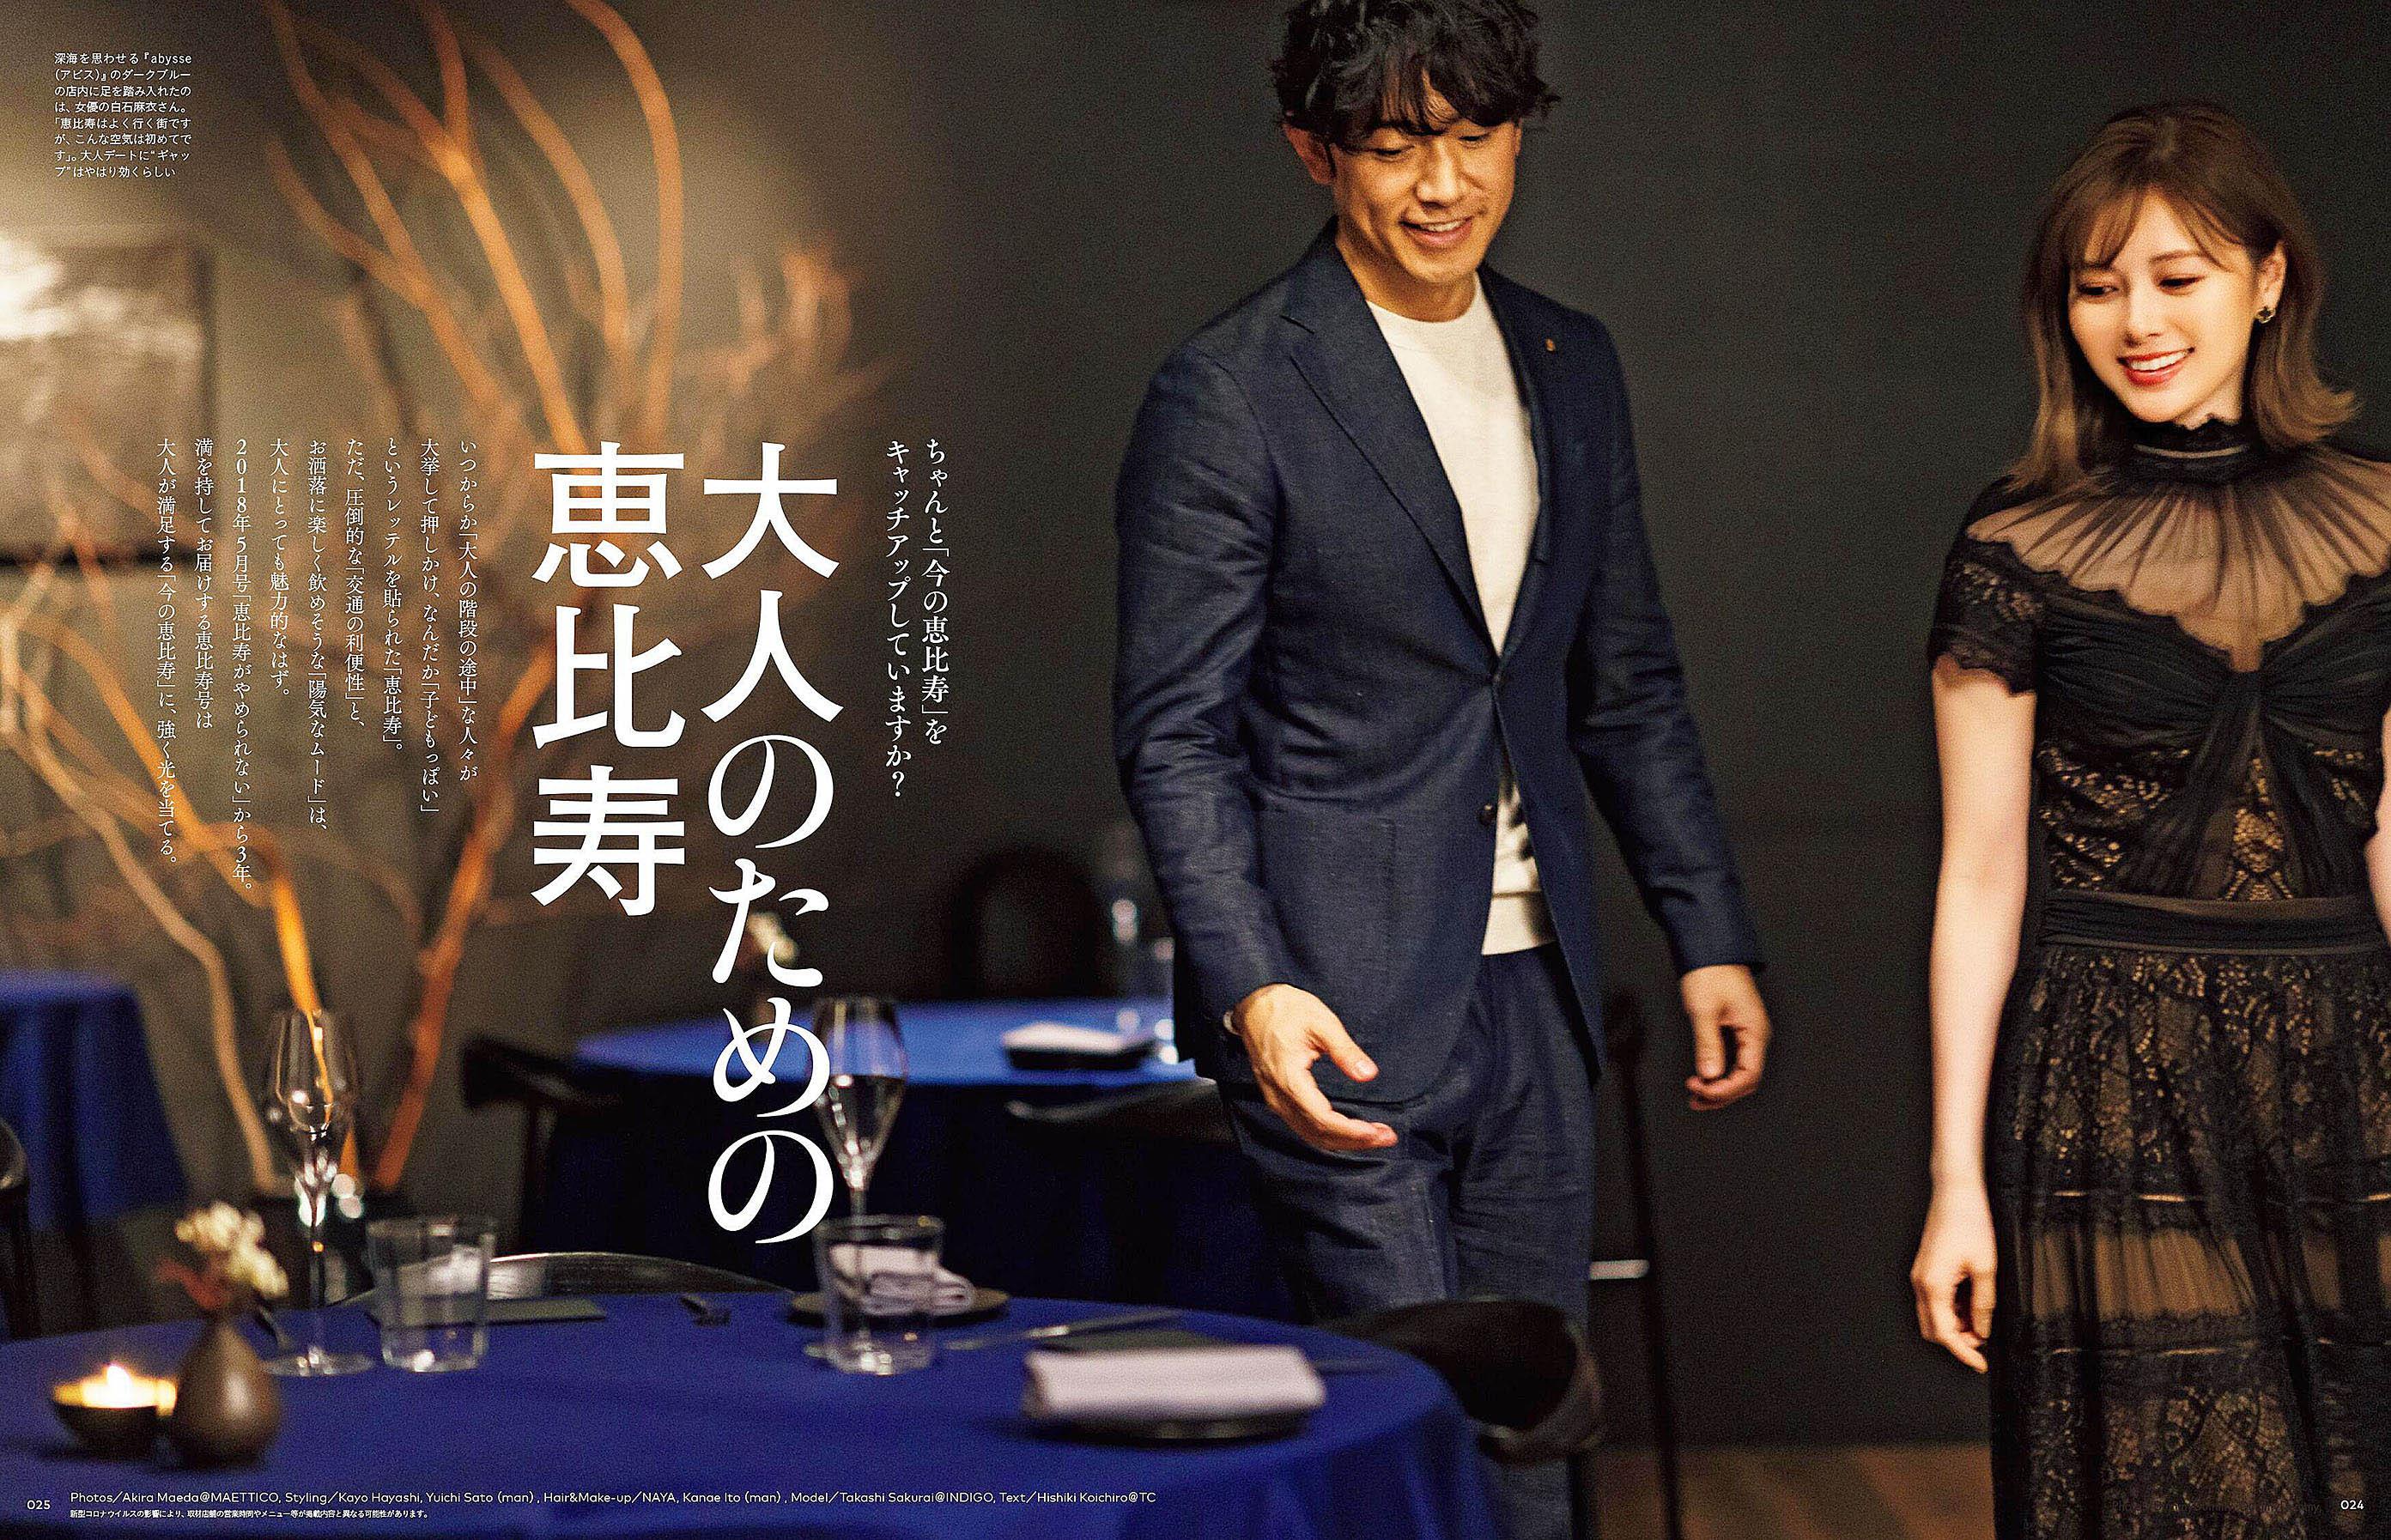 MShiraishi Tokyo Calendar 2104 02.jpg